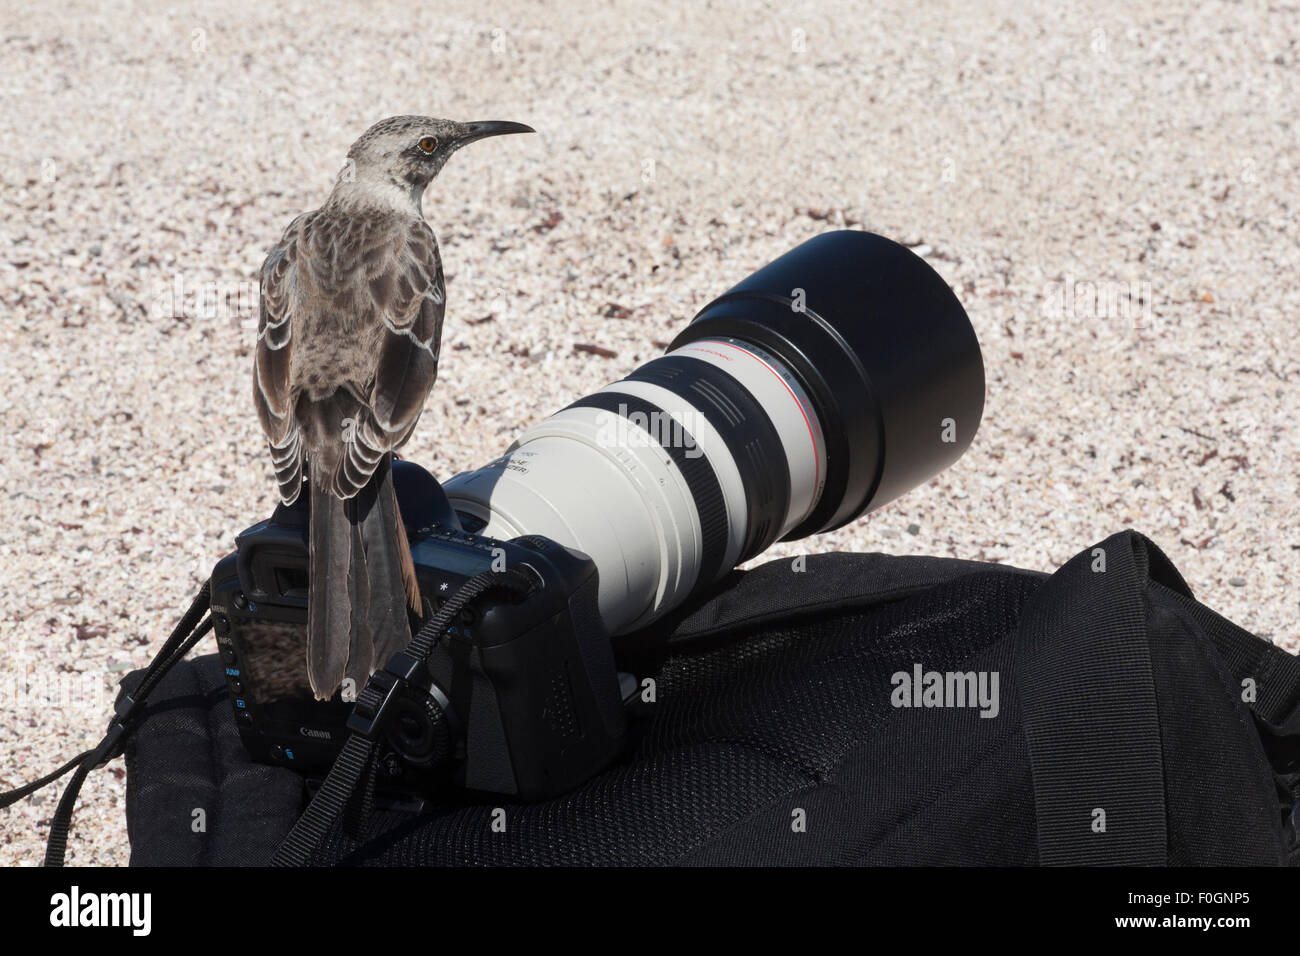 Espanola Mockingbird (Mimus macdonaldi) perched on tourist's camera and pack. Stock Photo